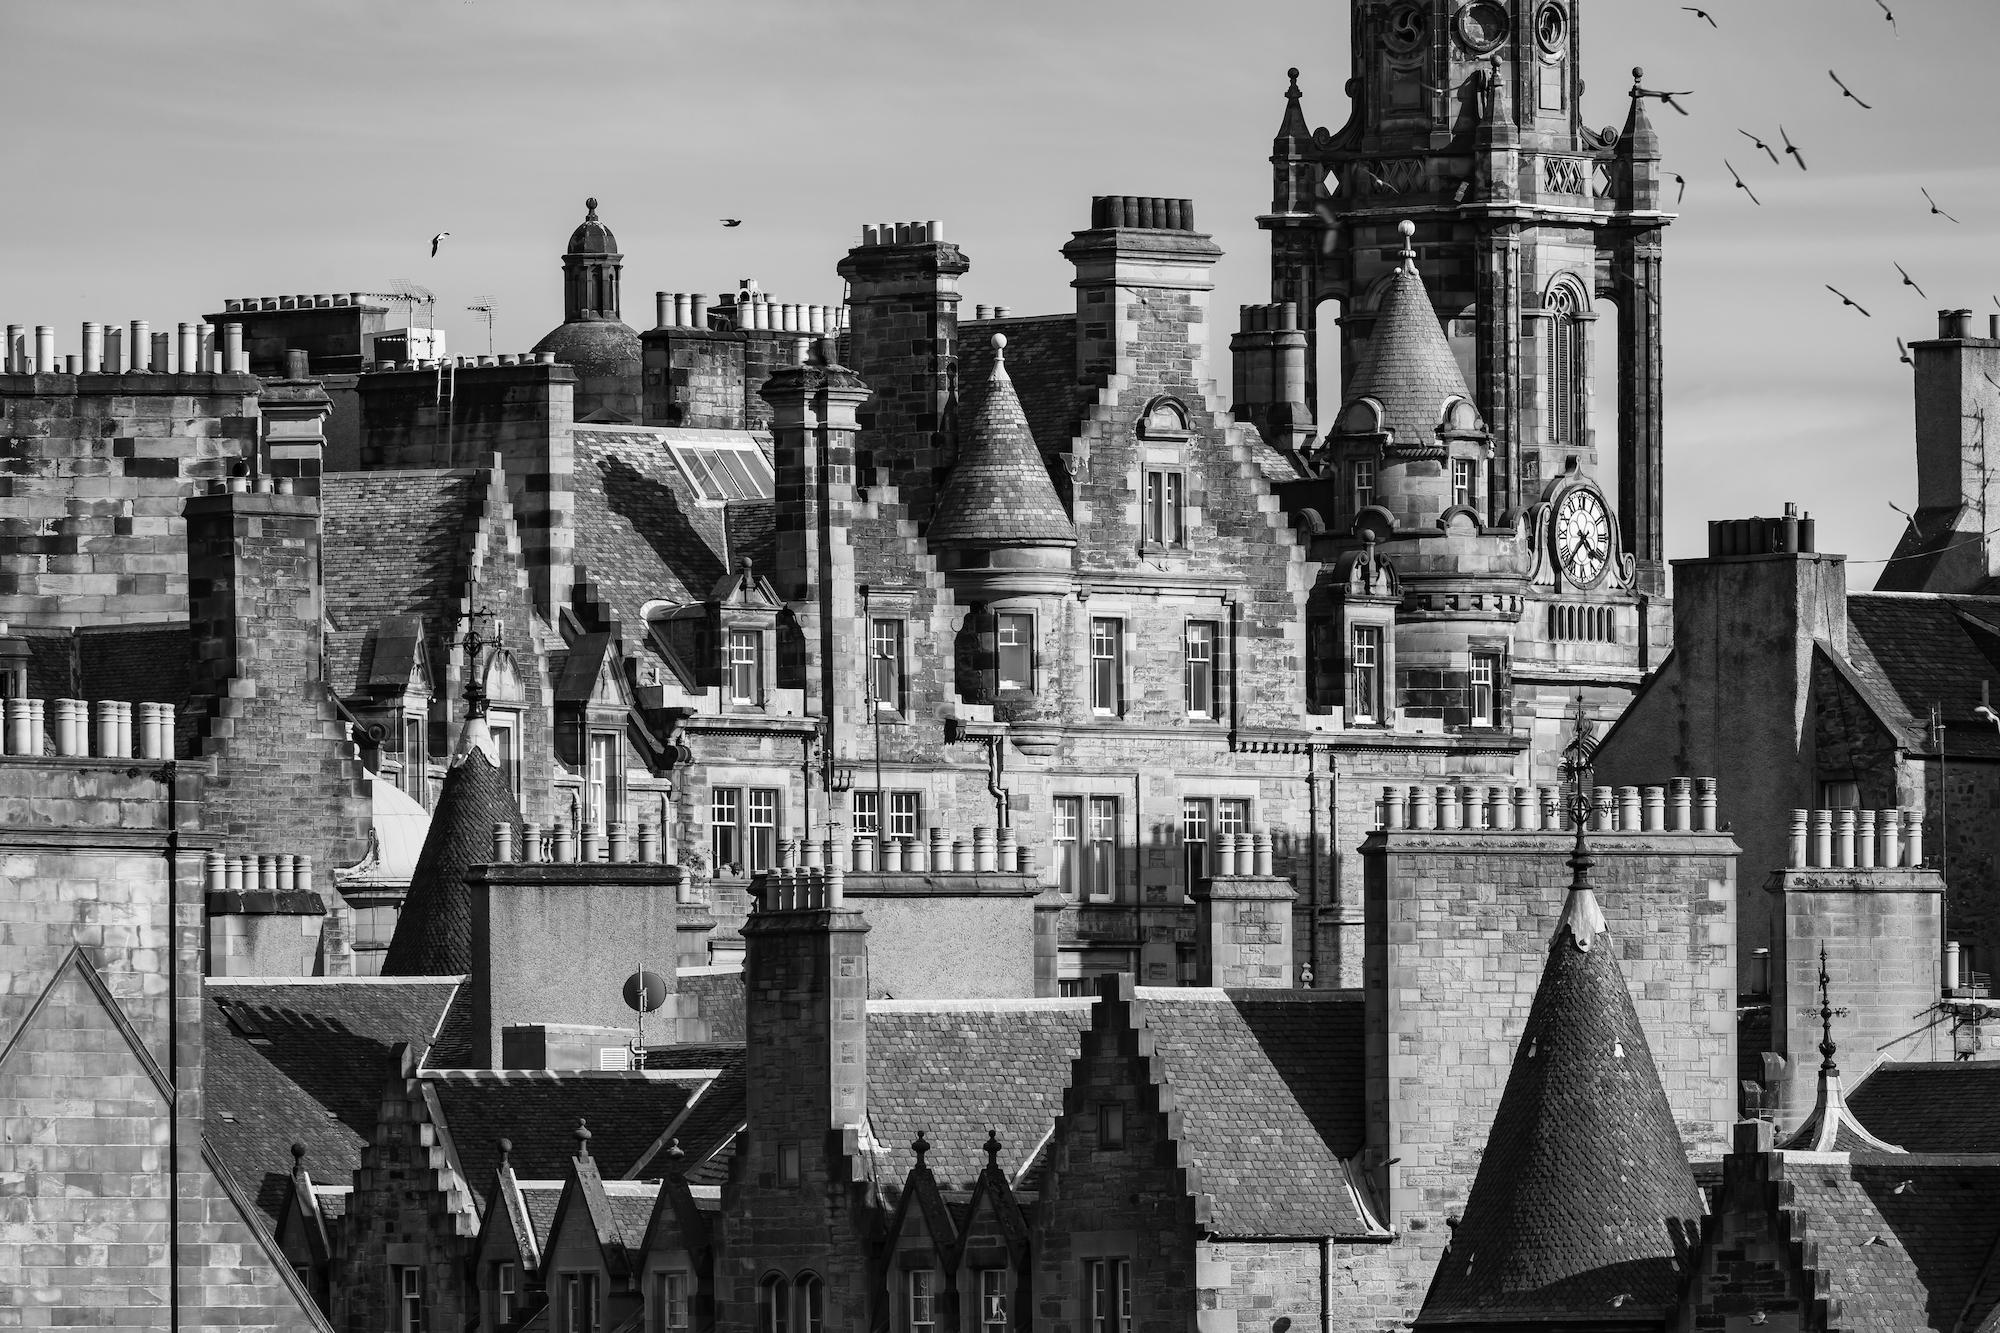 (488) Tenement Rooftops in Cockburn Street and The Tron Kirk Steeple, Royal Mile, Edinburgh, Scotland.jpg